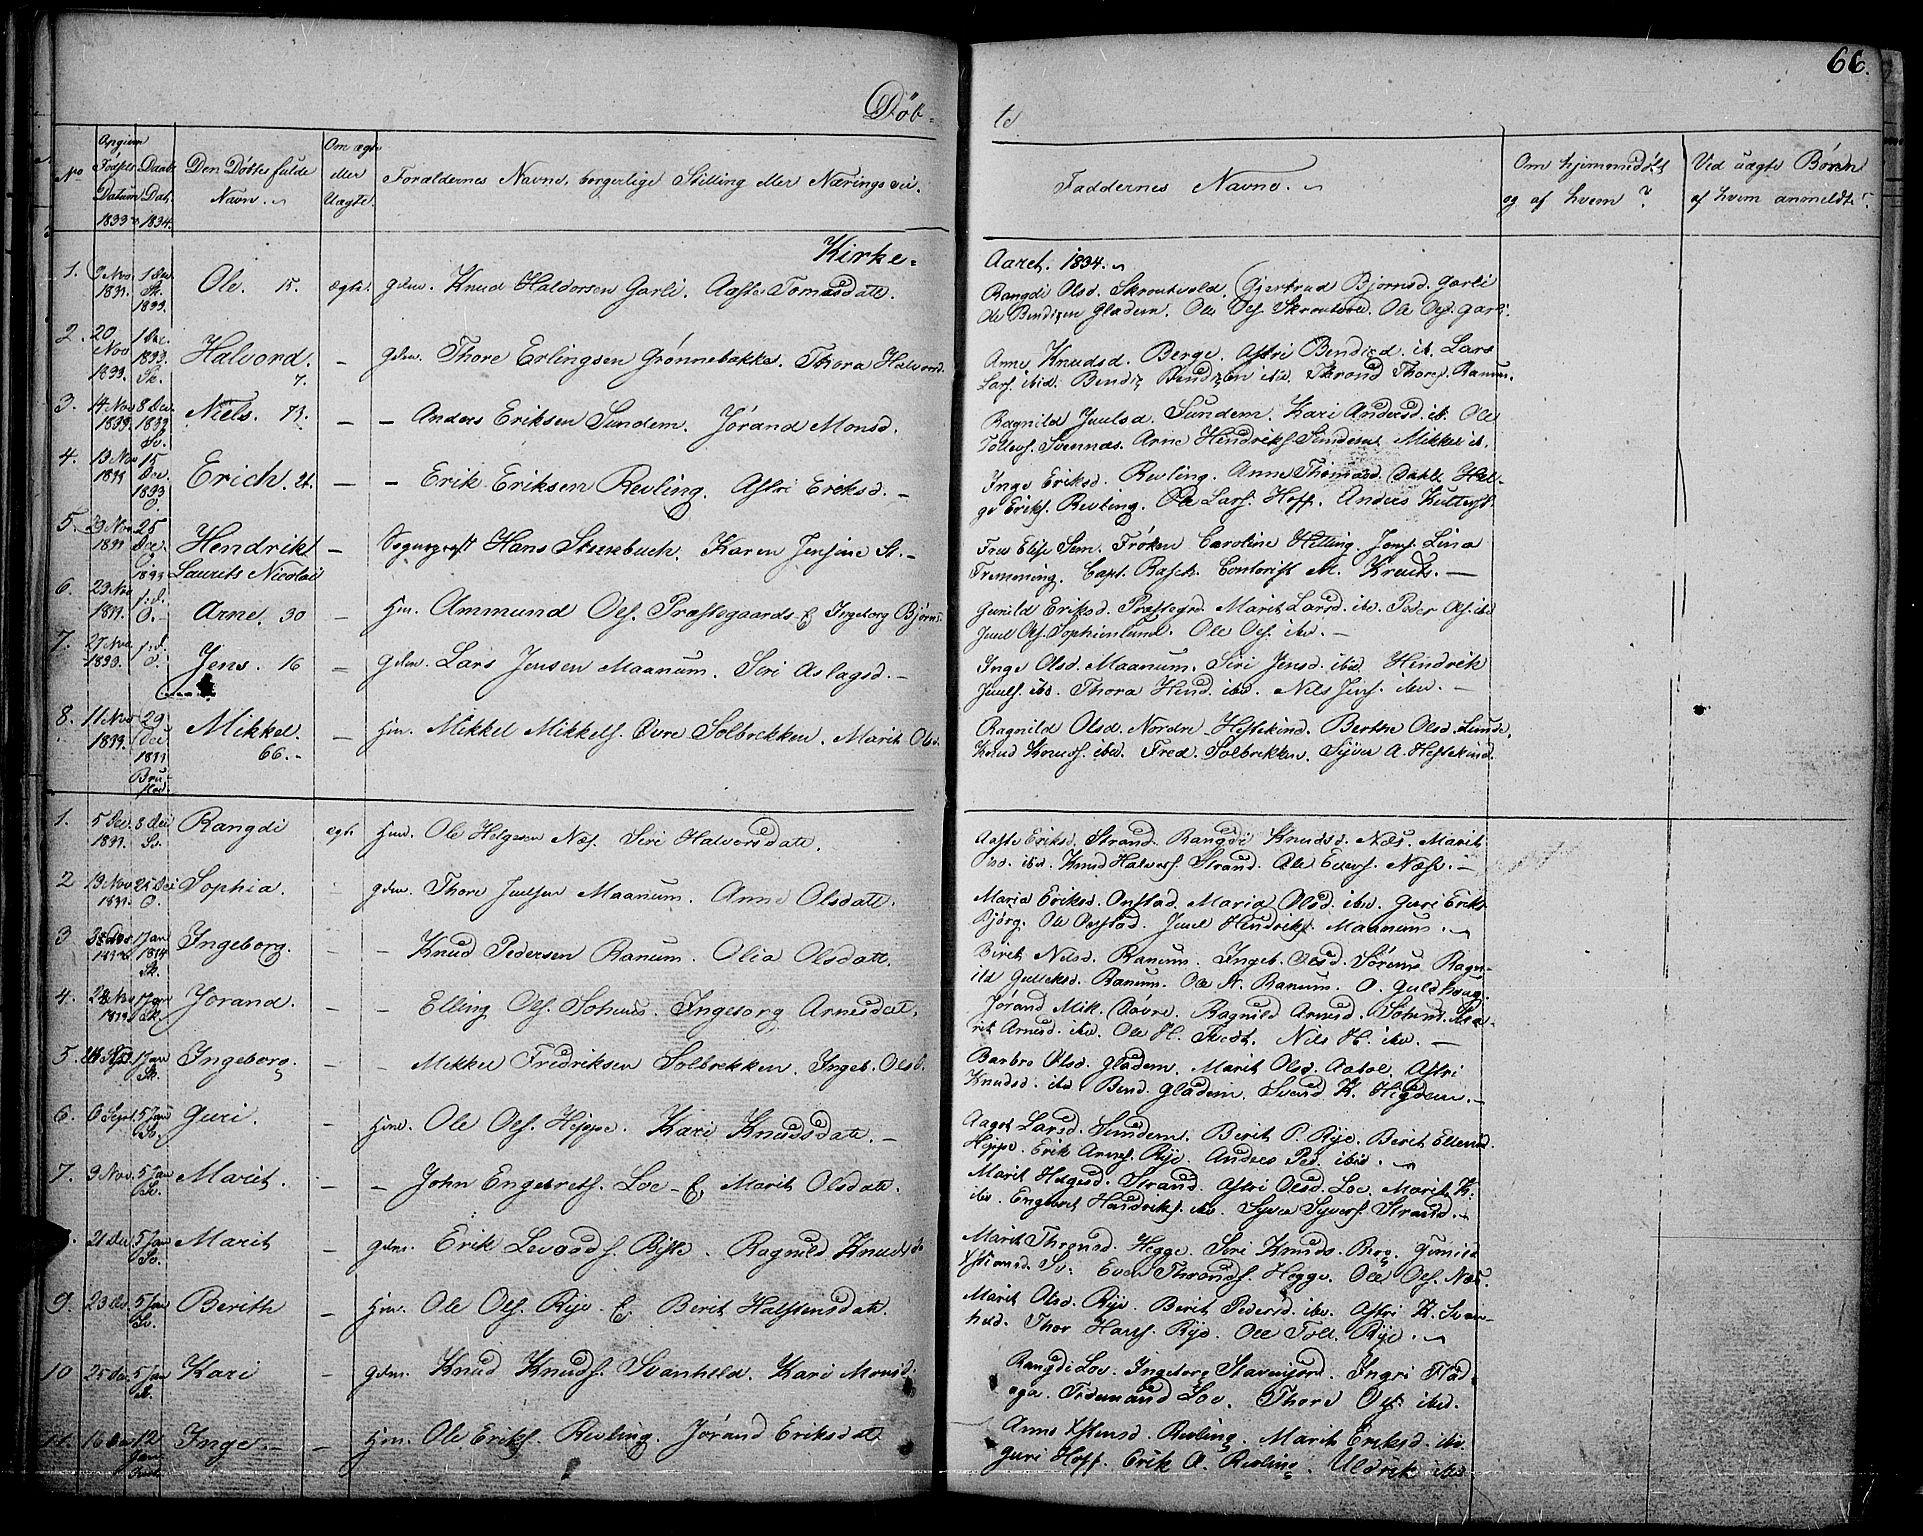 SAH, Nord-Aurdal prestekontor, Ministerialbok nr. 3, 1828-1841, s. 66